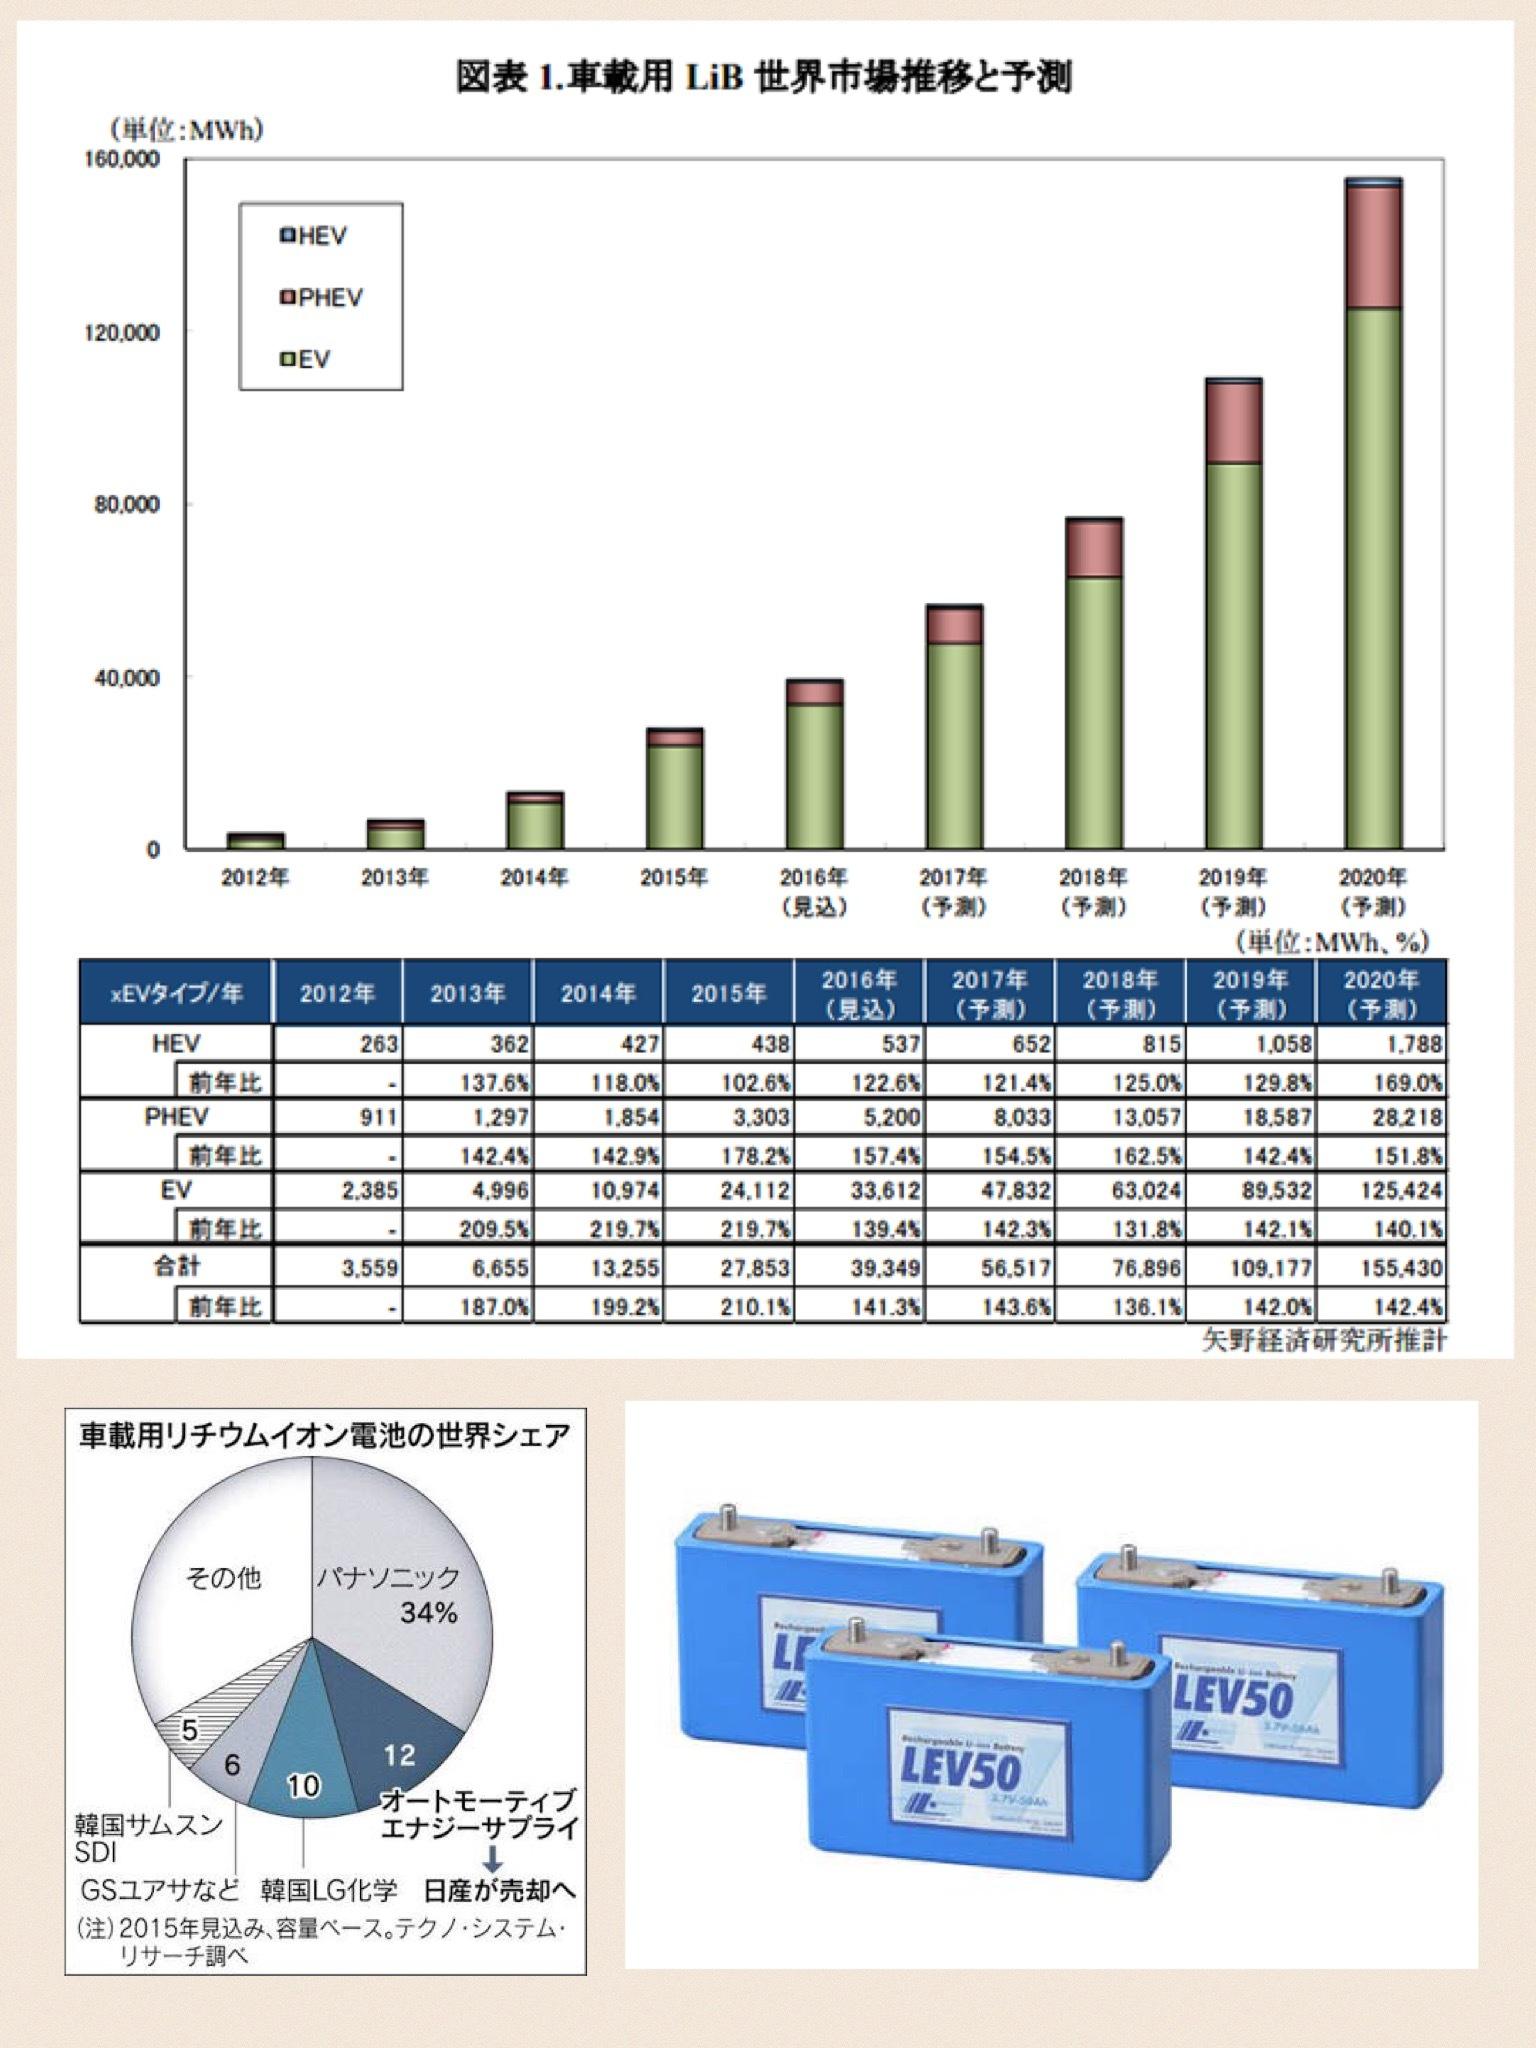 車載用リチウムイオン電池世界市場 2016